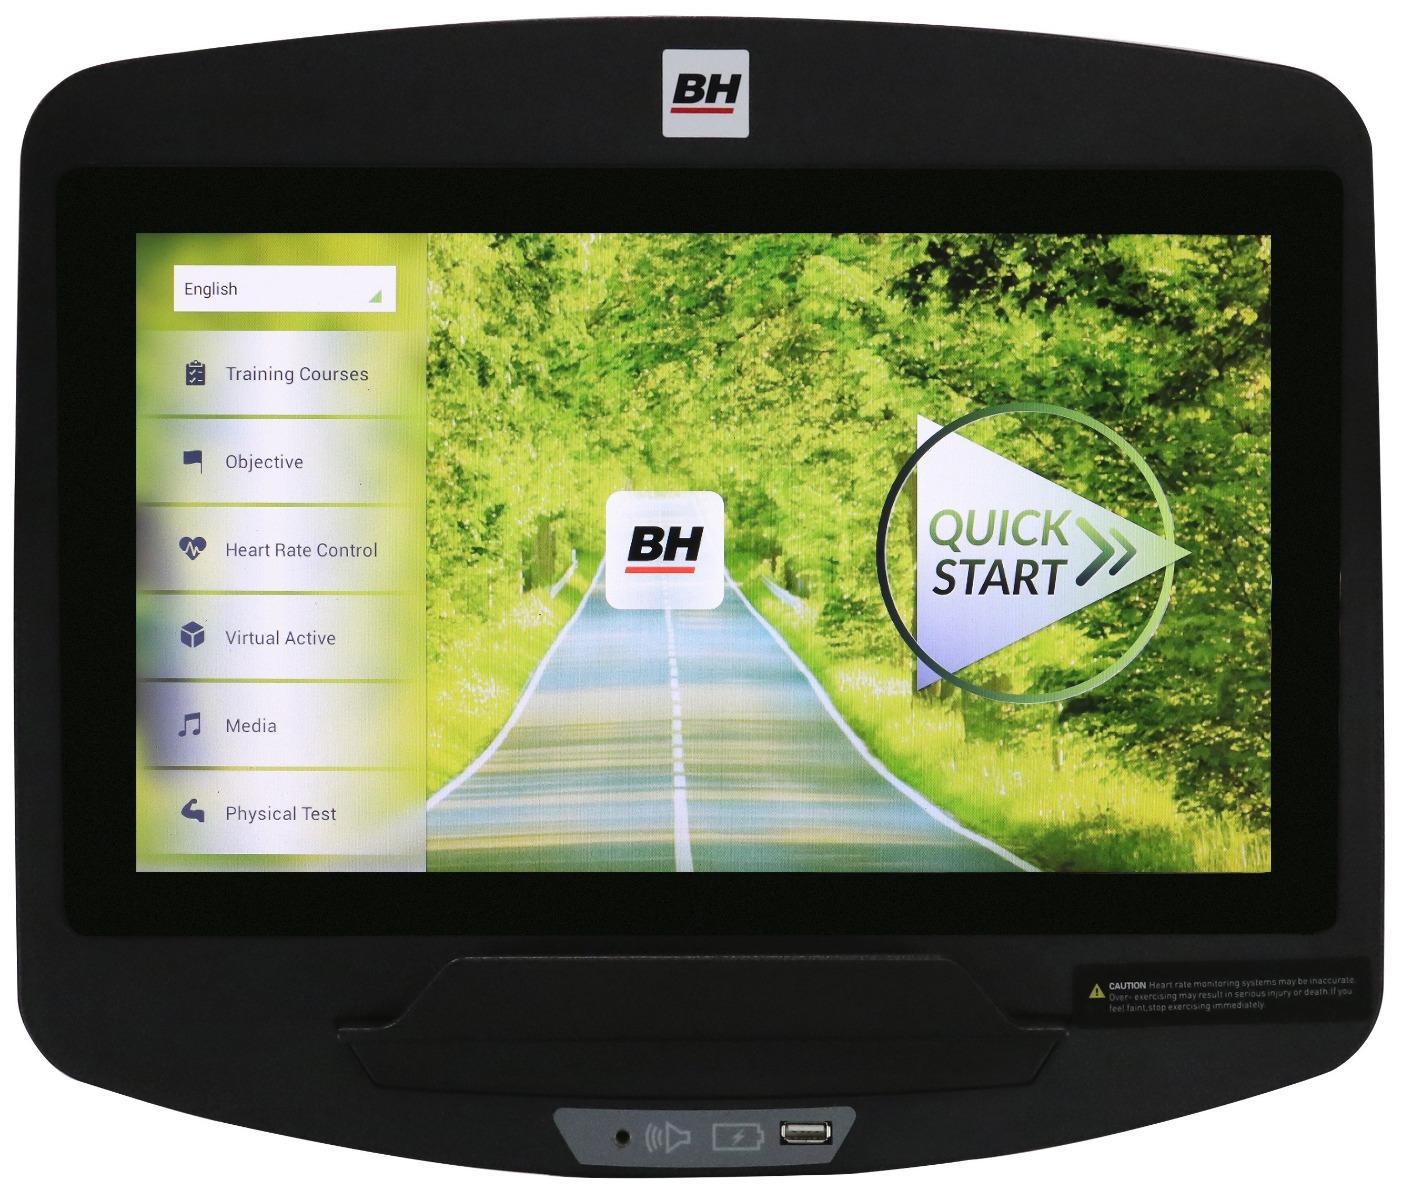 BH Fitness LK700RUE16SF SmartFocus Console